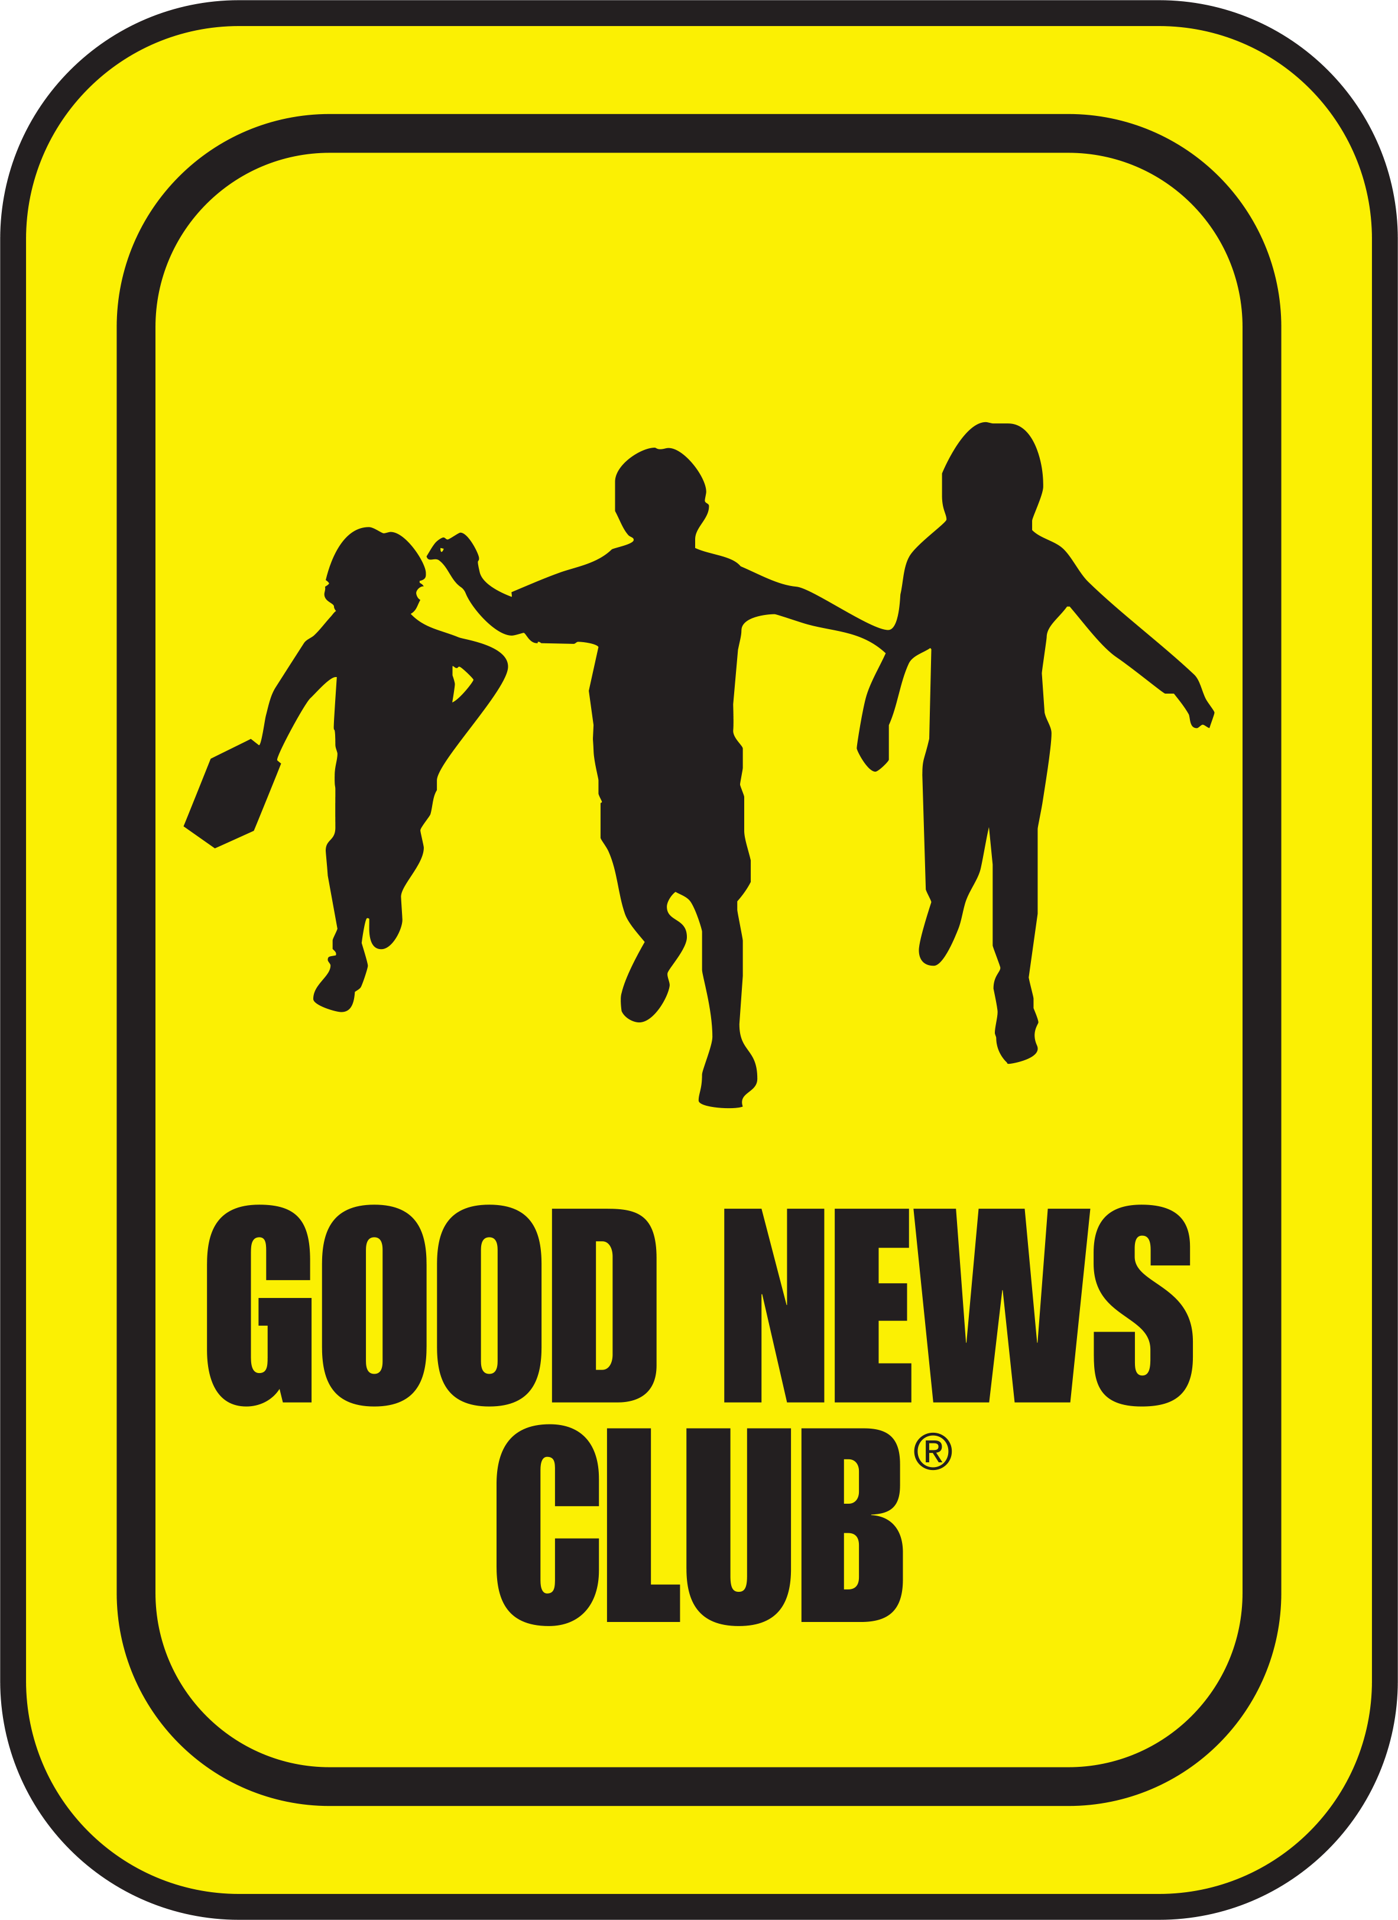 Good News Club - Child Evangelism Fellowship